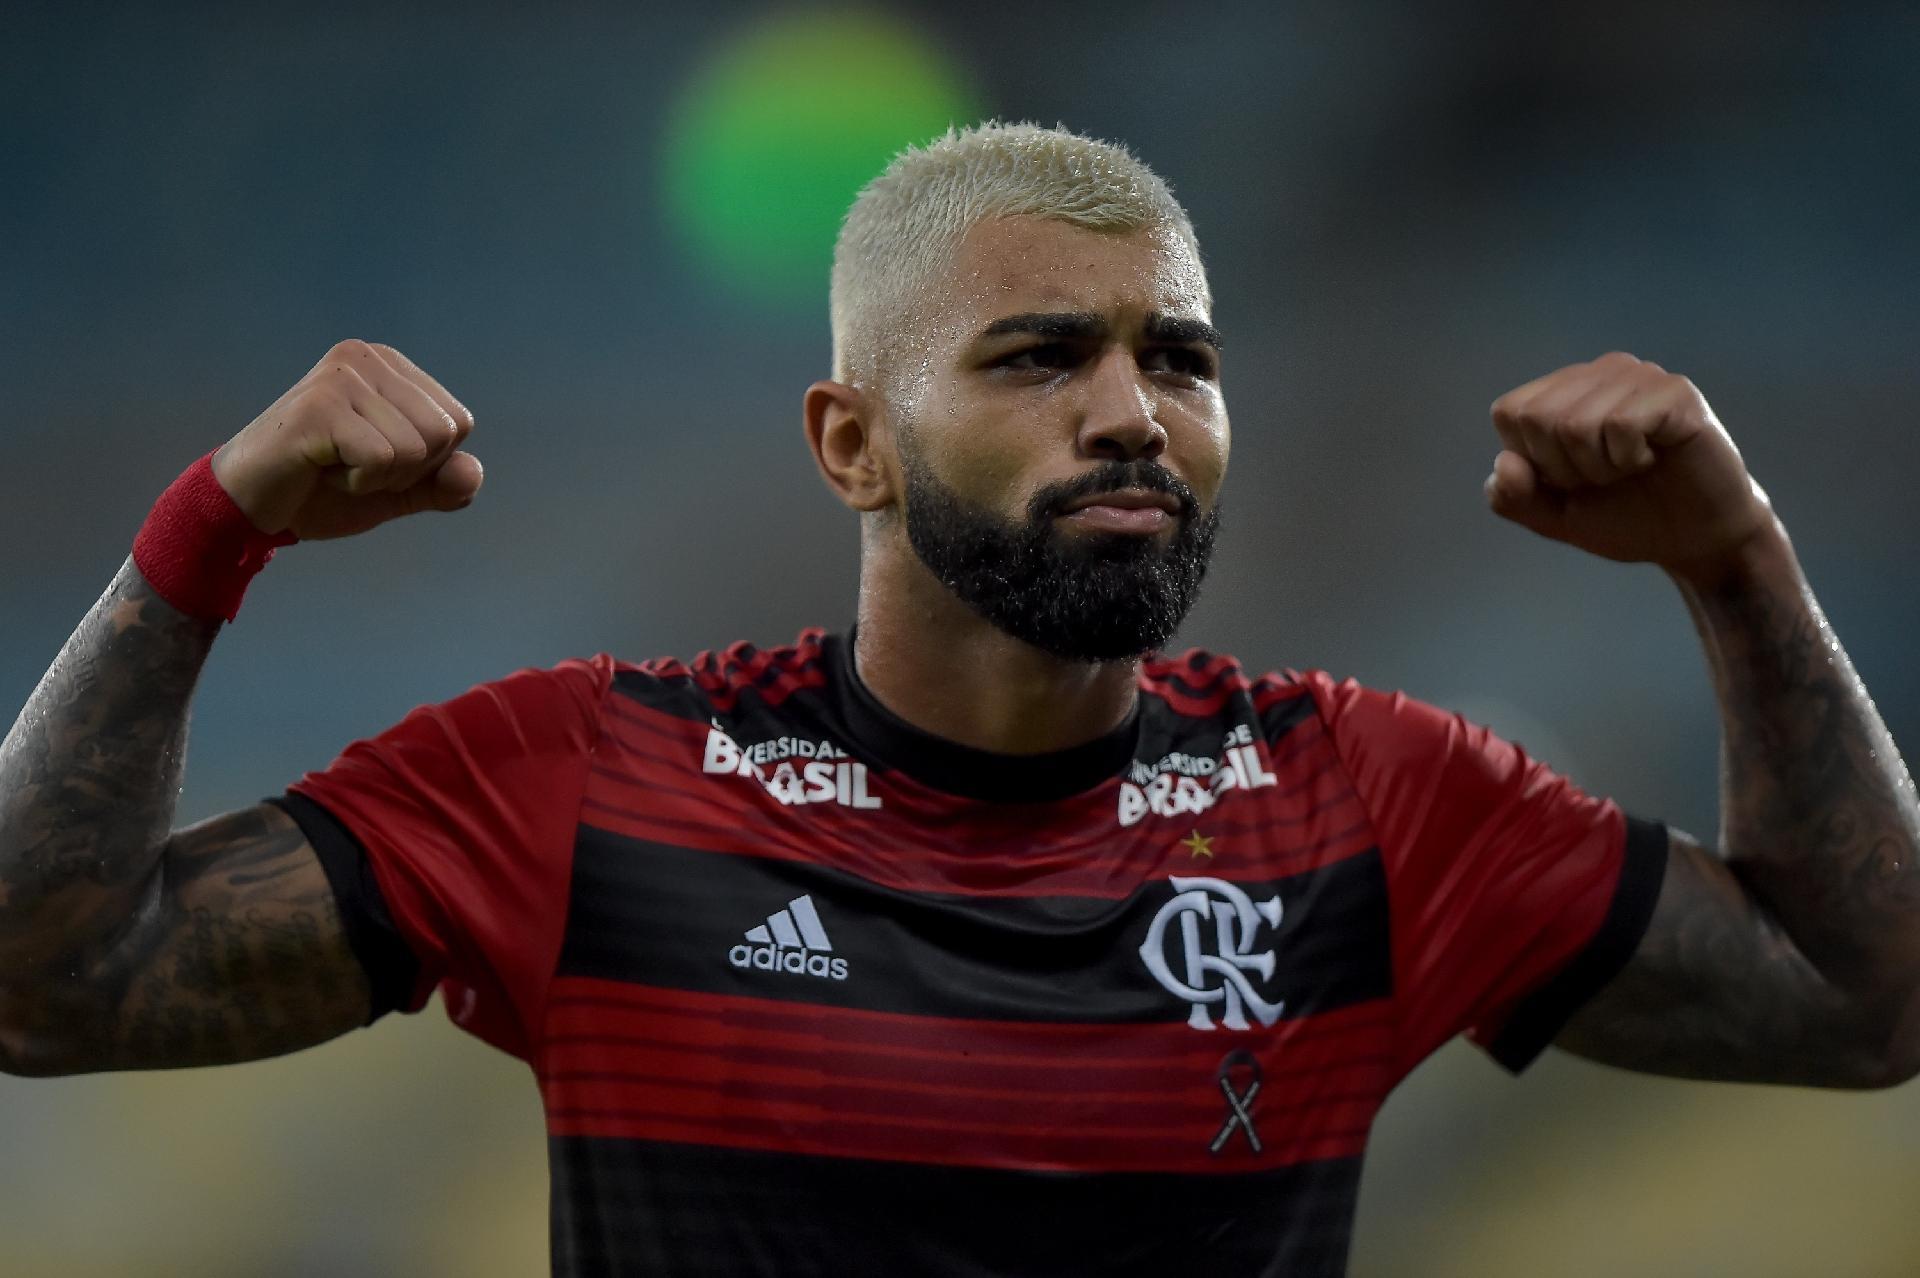 c8556272dbec5 Flamengo  Gabigol se divide entre gols e chances perdidas para virar  retrato do Rubro-negro